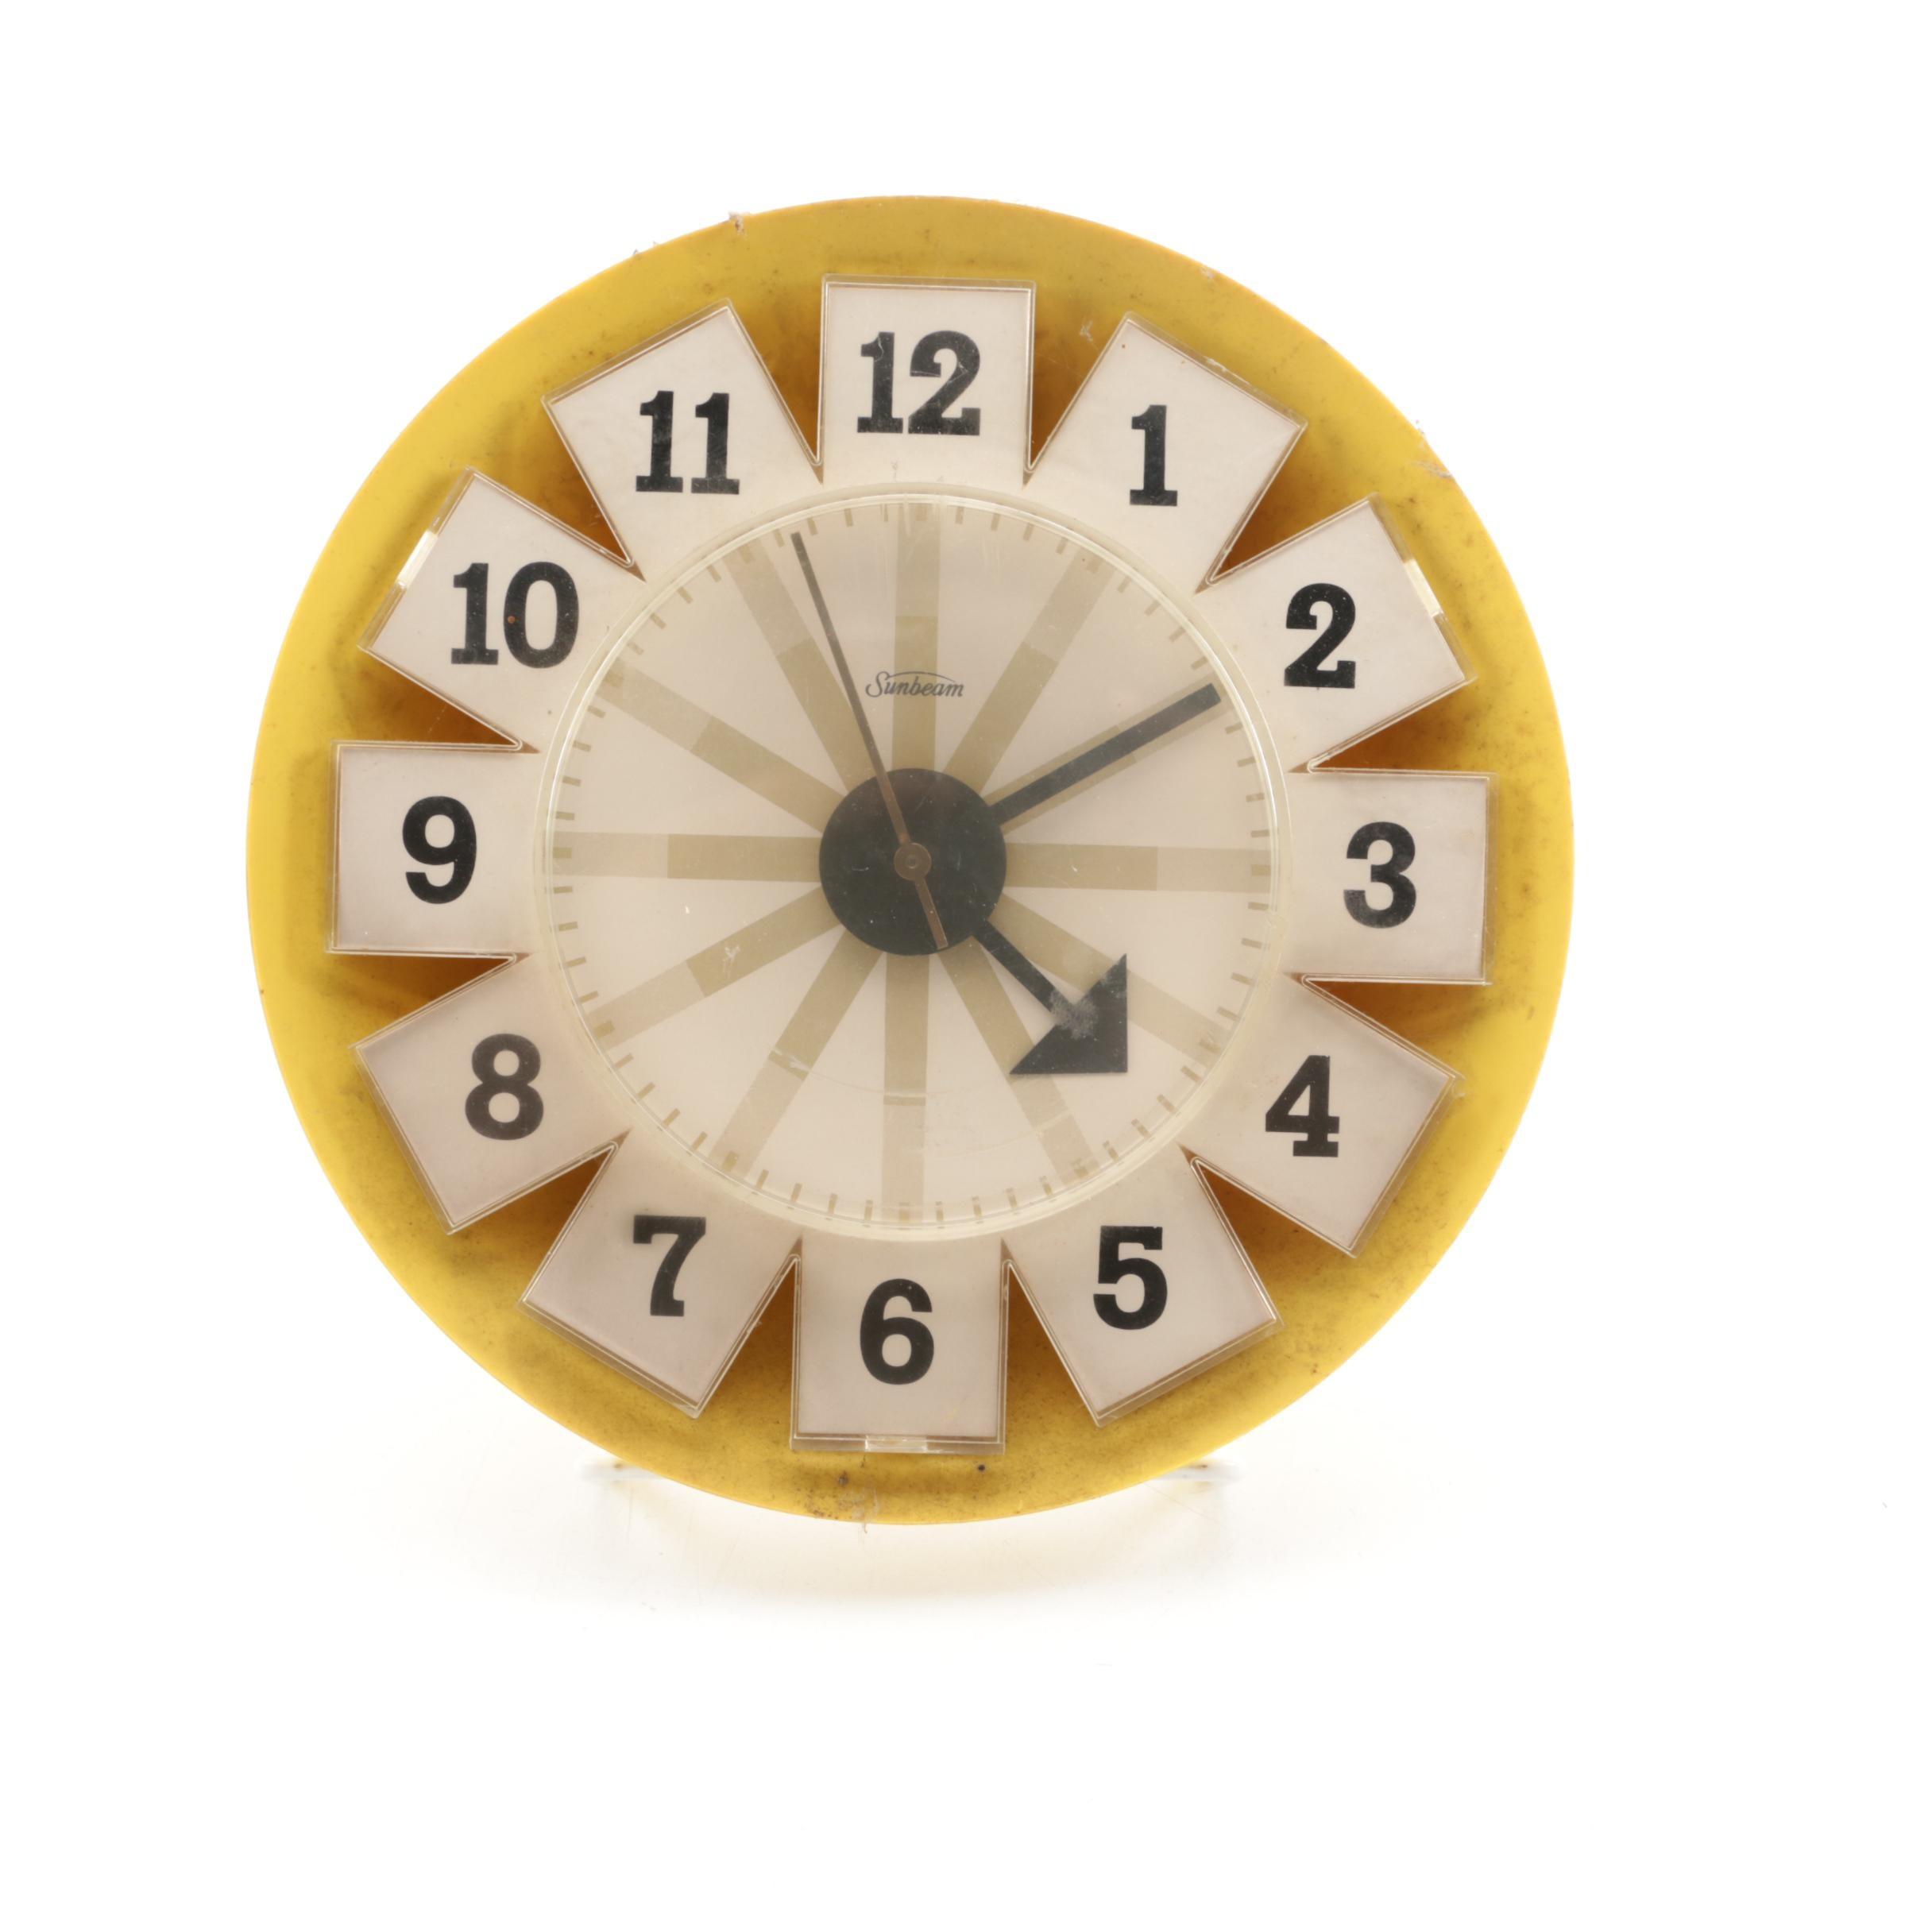 Vintage Sunbeam Kitchen Wall Clock